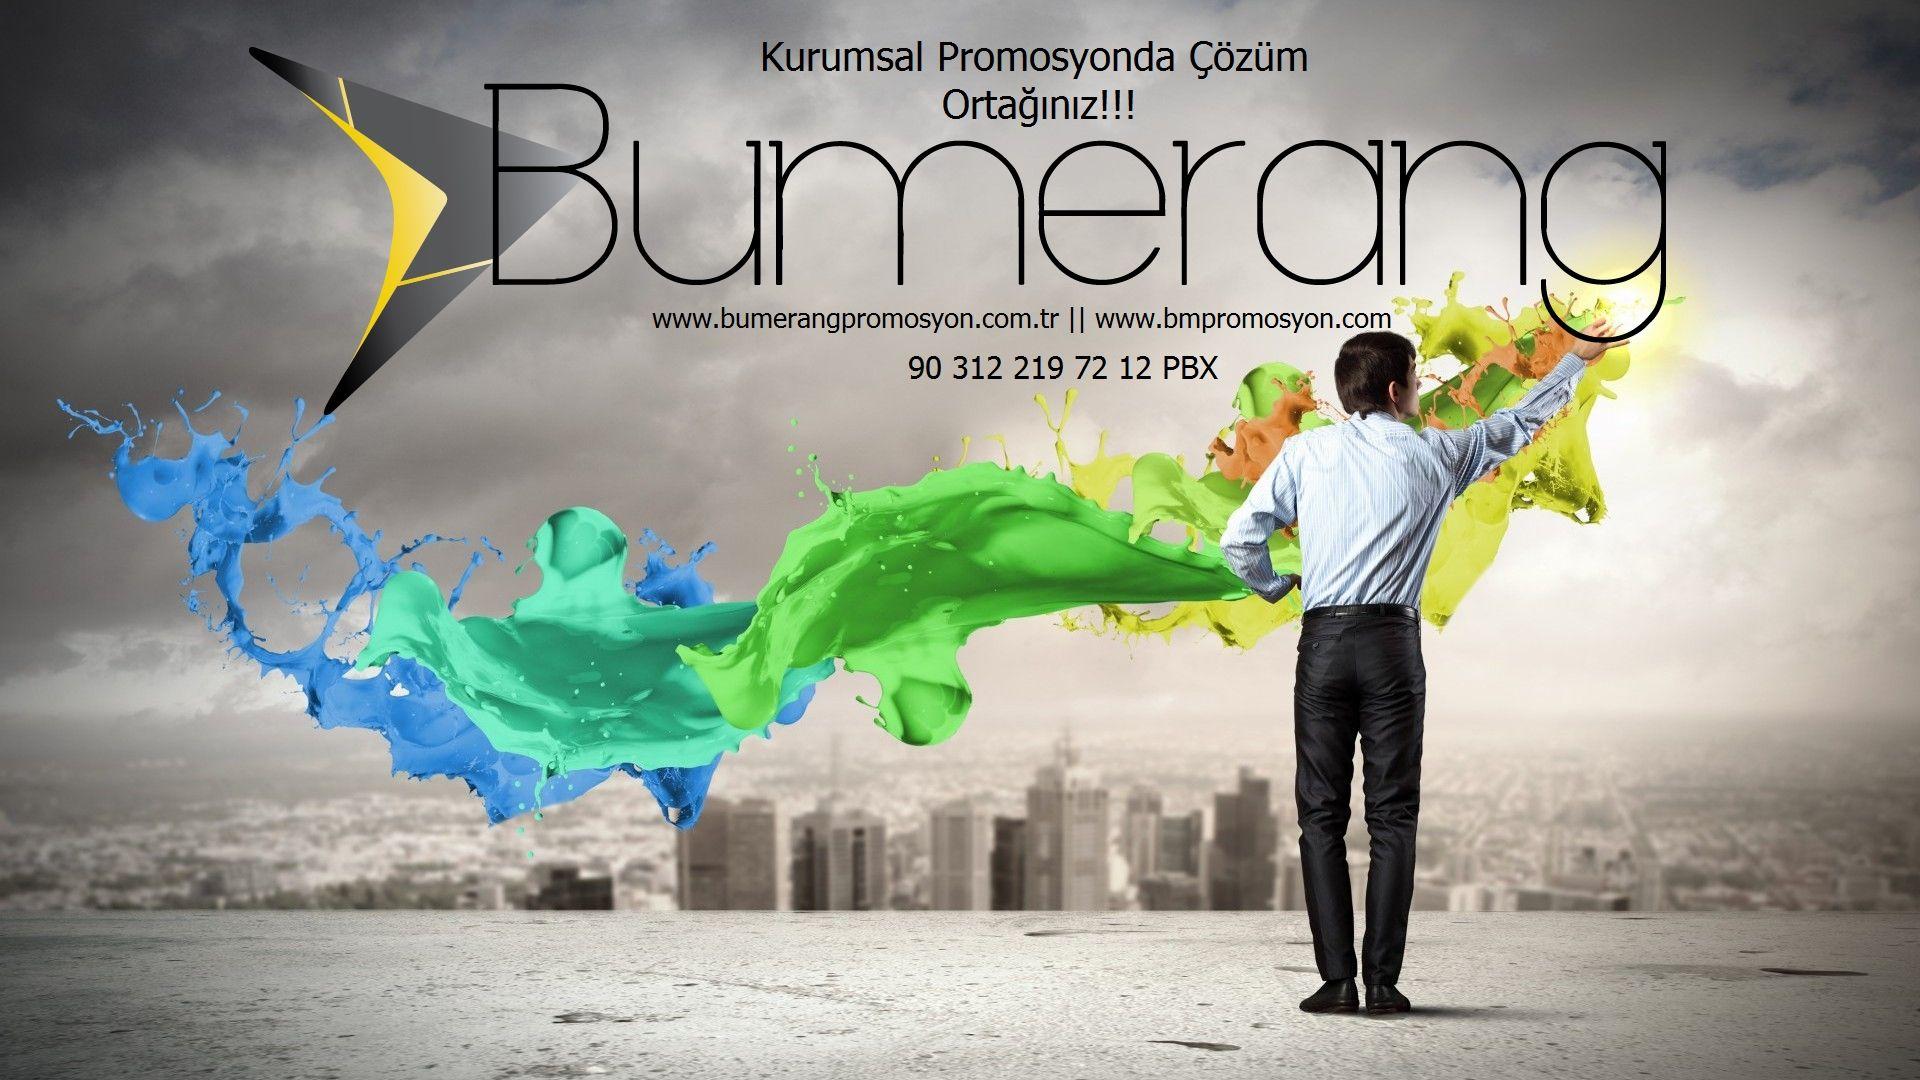 Mesnevi Sokak şu şehirde Ankara, Ankara Tasarım web